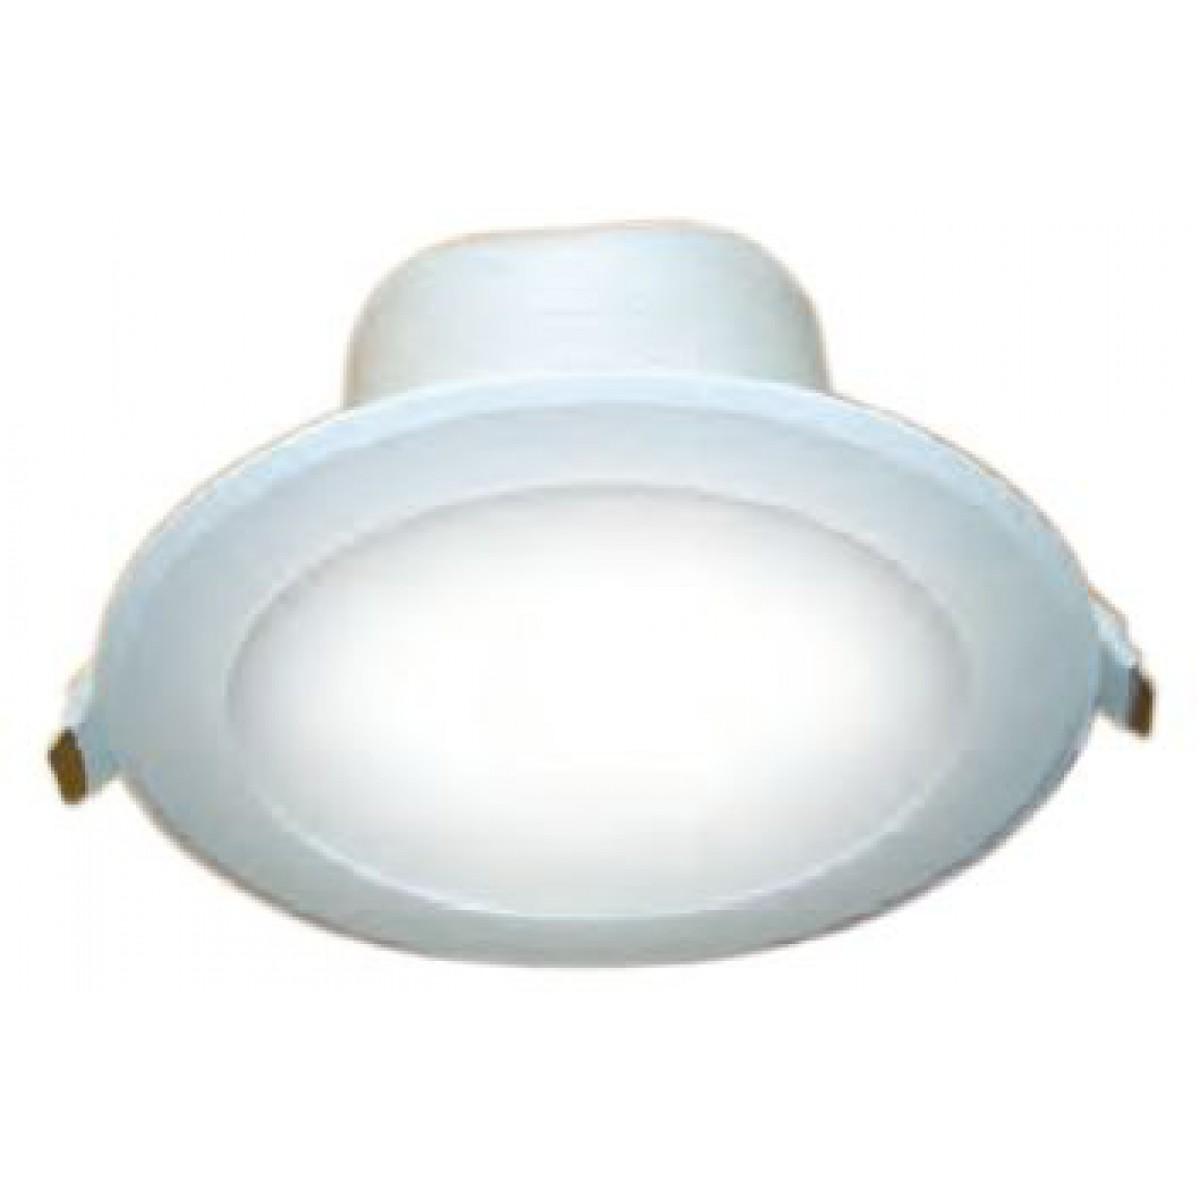 FARO INCASSO LED 10W 230V LAMPO LIGHTING ( 3TONALITA') - LAMPO SNC SYDNEY10WMC